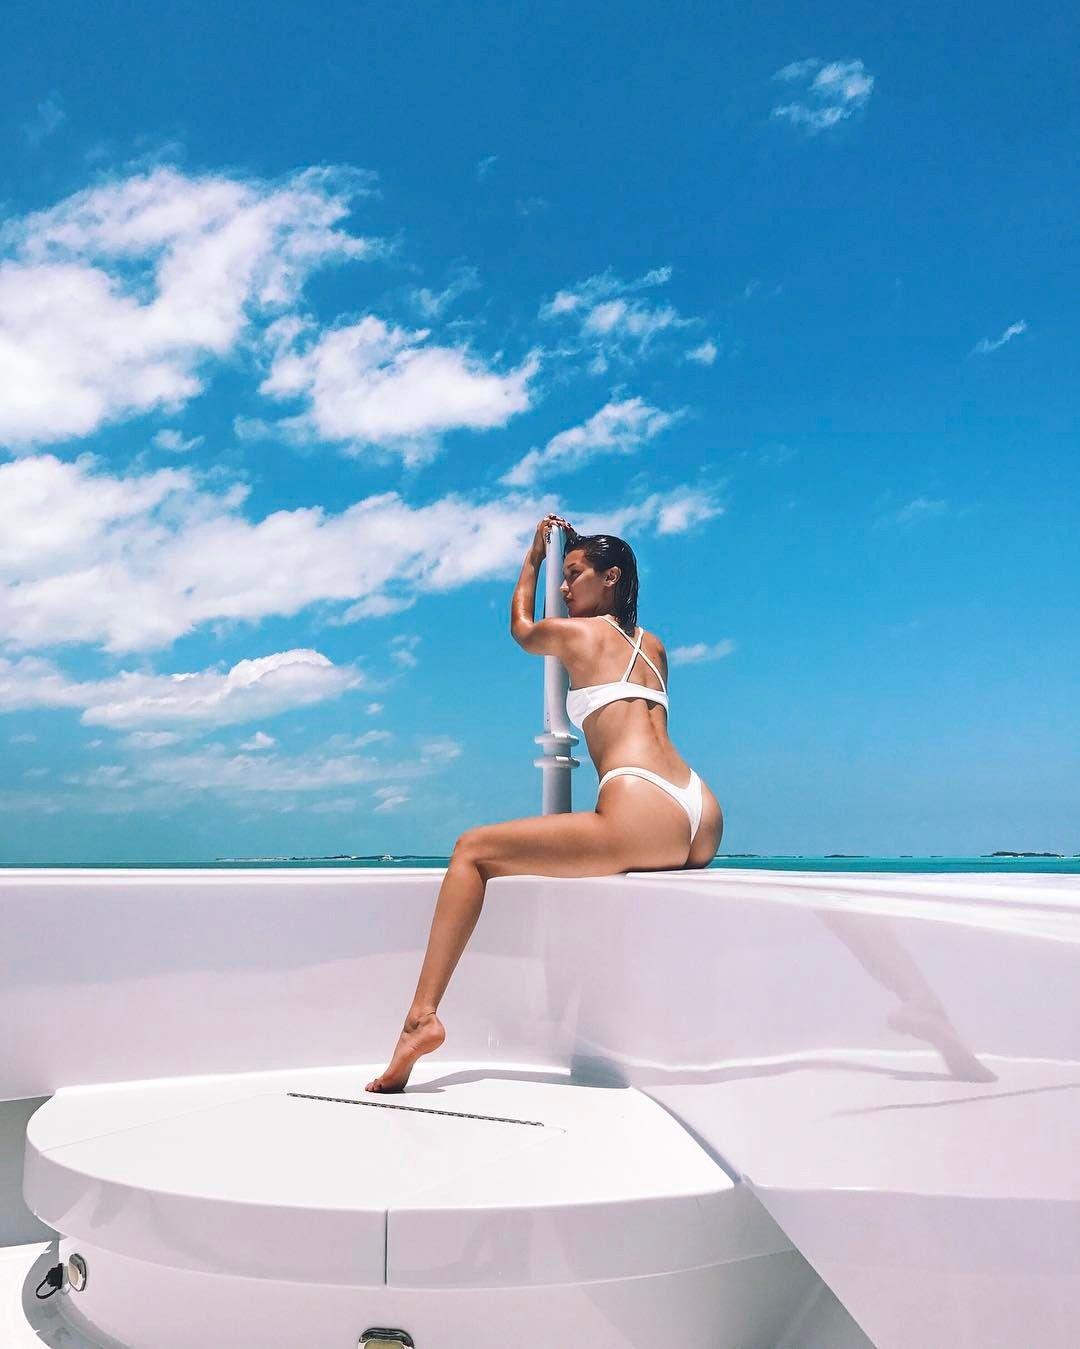 Bella Hadid Pakai Bikini Kekecilan, Underboob 'Nongol'